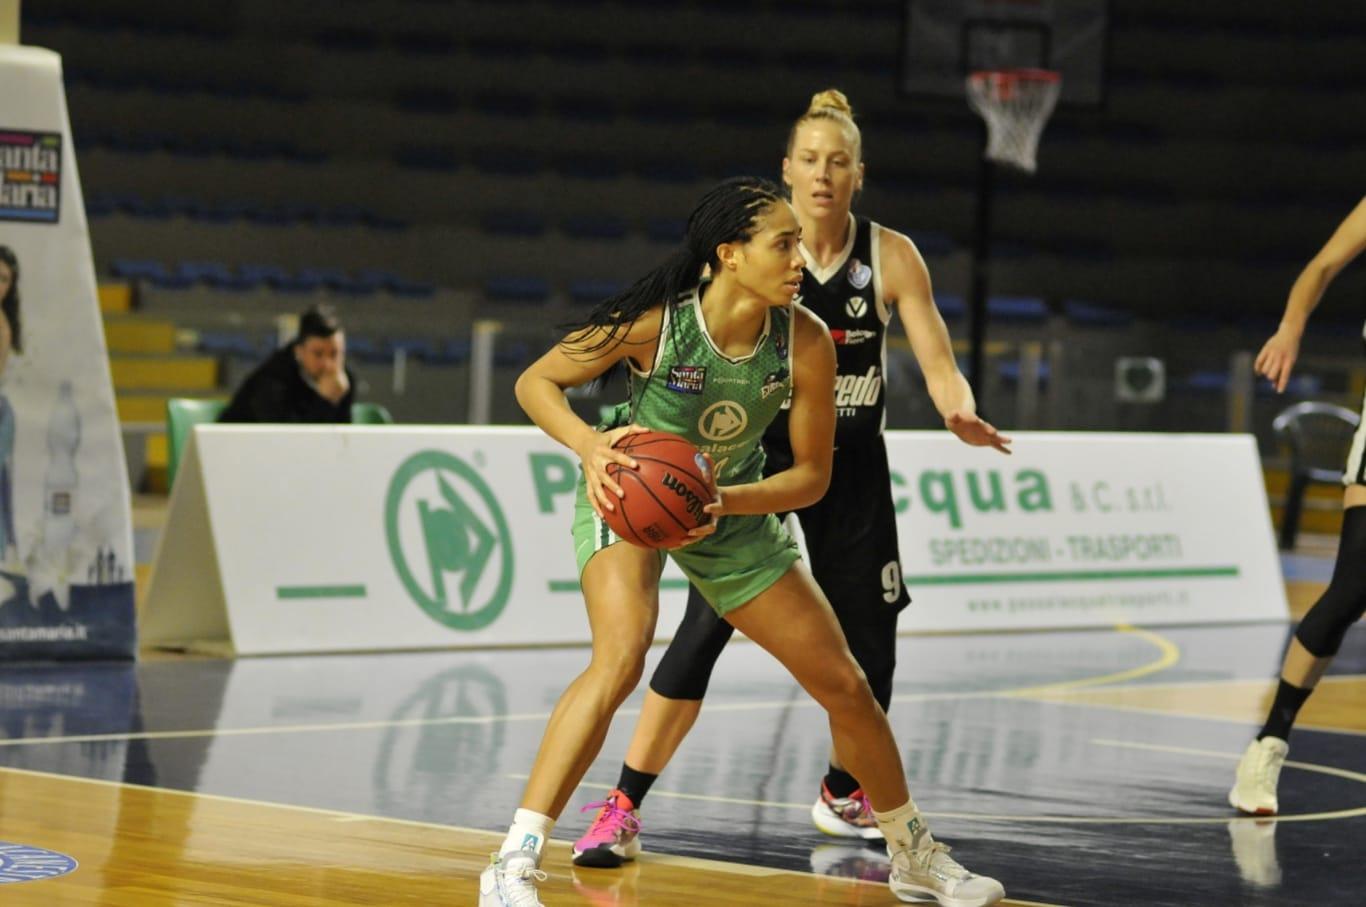 Basket donne, ottava vittoria consecutiva per Ragusa: messo sotto Bologna 86-82